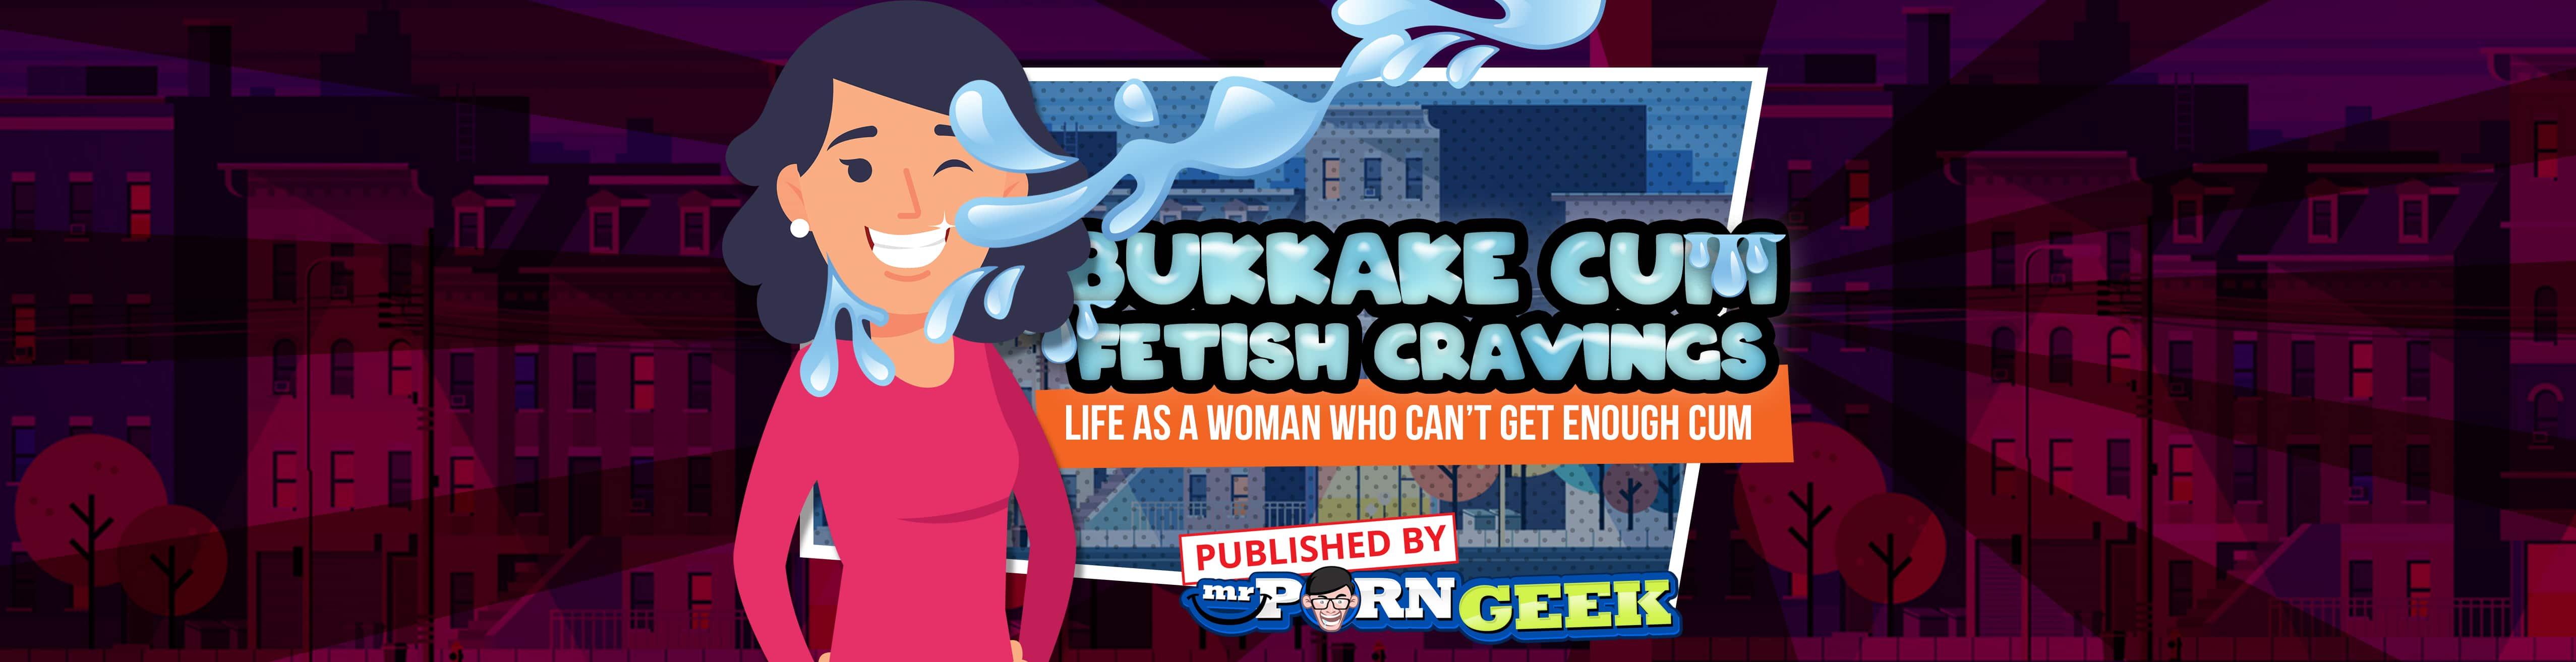 Animate Cartoons Film Porn Blog bukkake cum fetish cravings – mrporngeek's blog